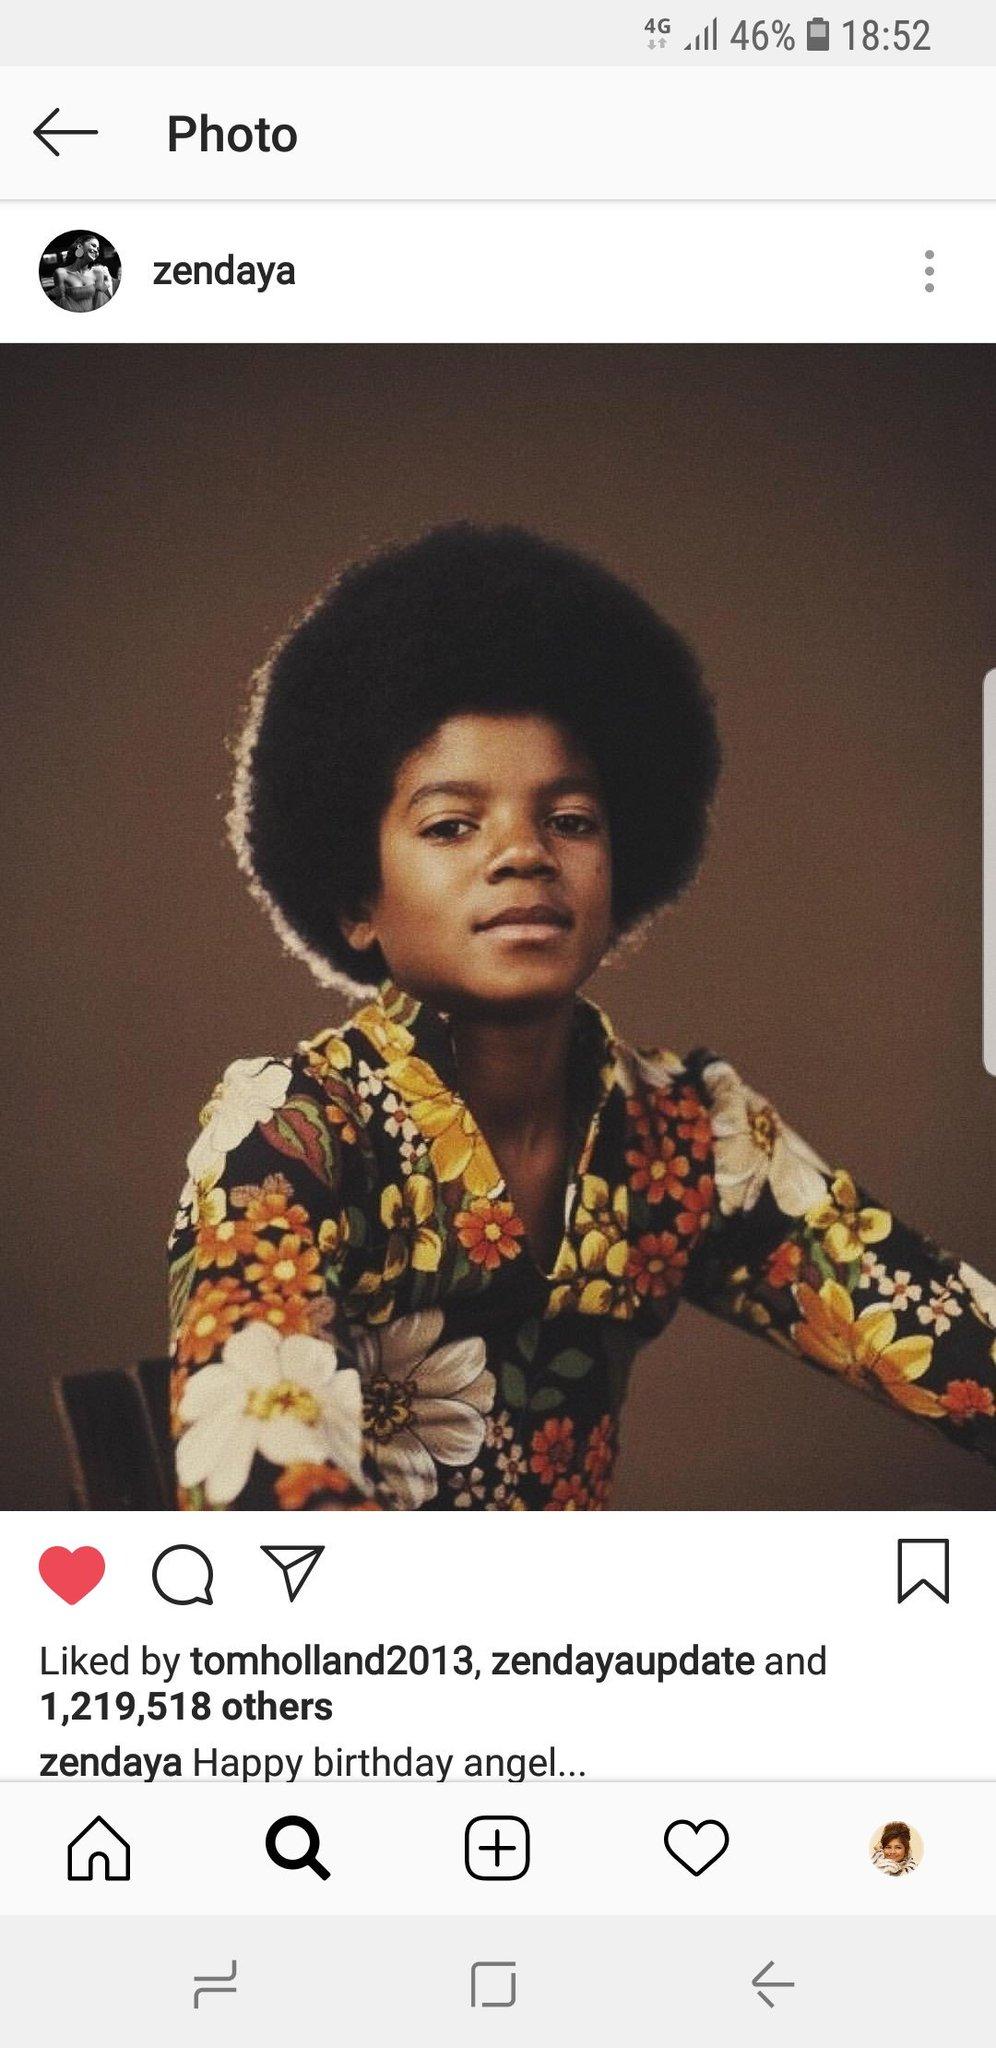 Waiting for Zendaya\s annual bday wish to Michael Jackson... Happy Birthday legend !